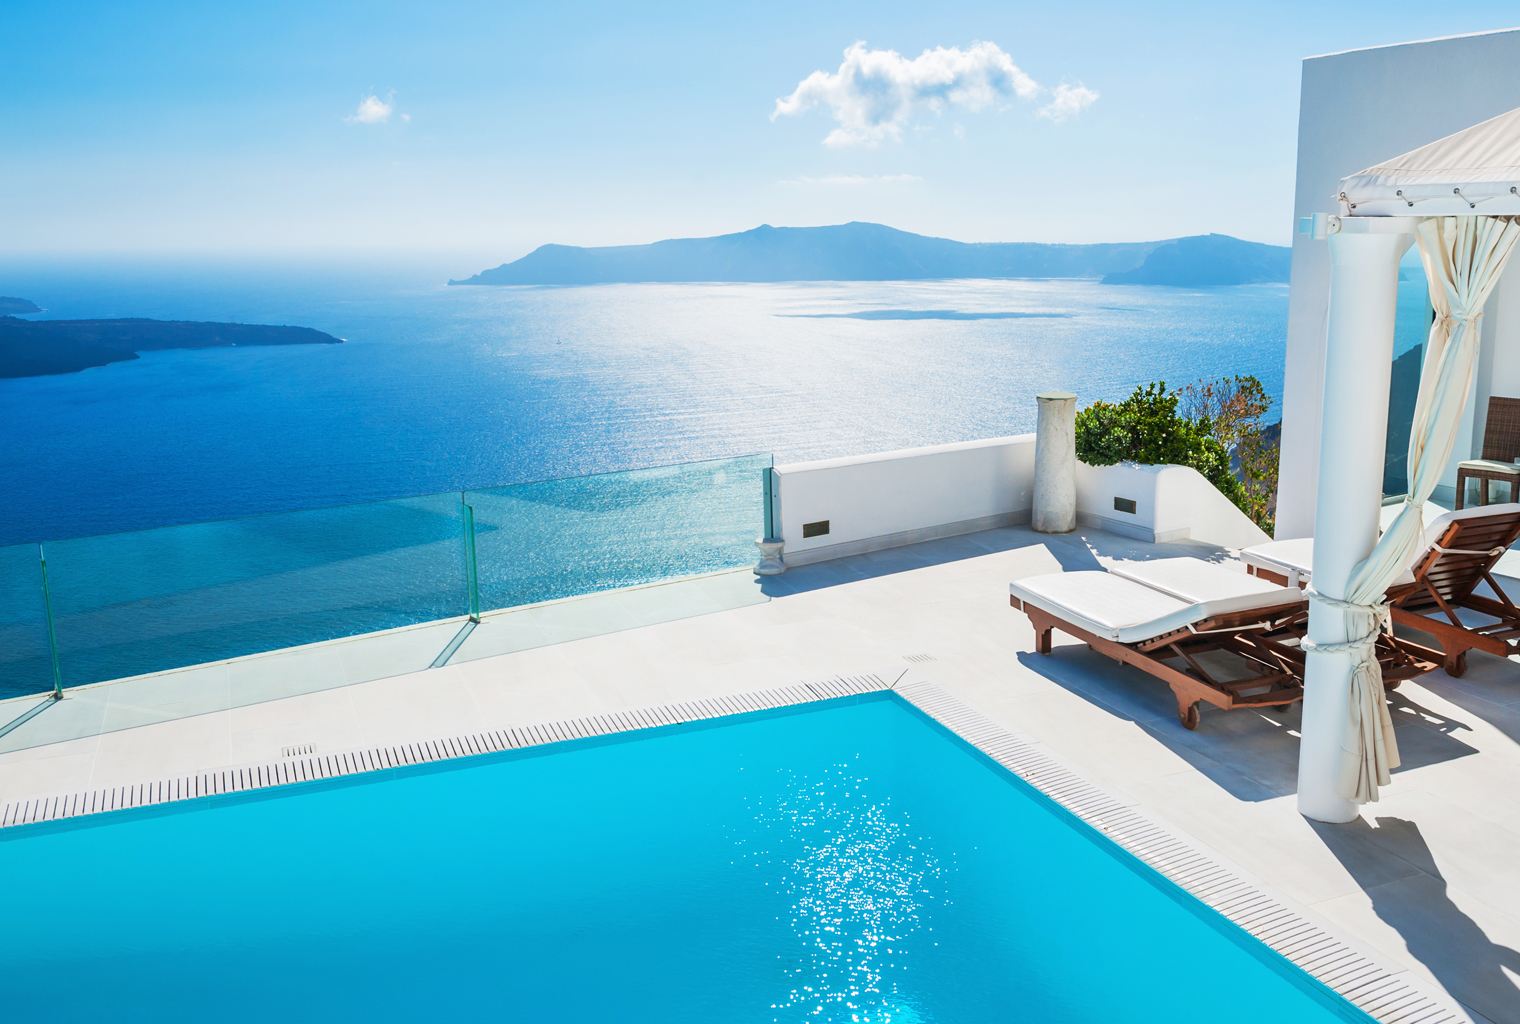 Travala se asocia con Booking.com: se agregaron 90,000 destinos de aceptación de cifrado